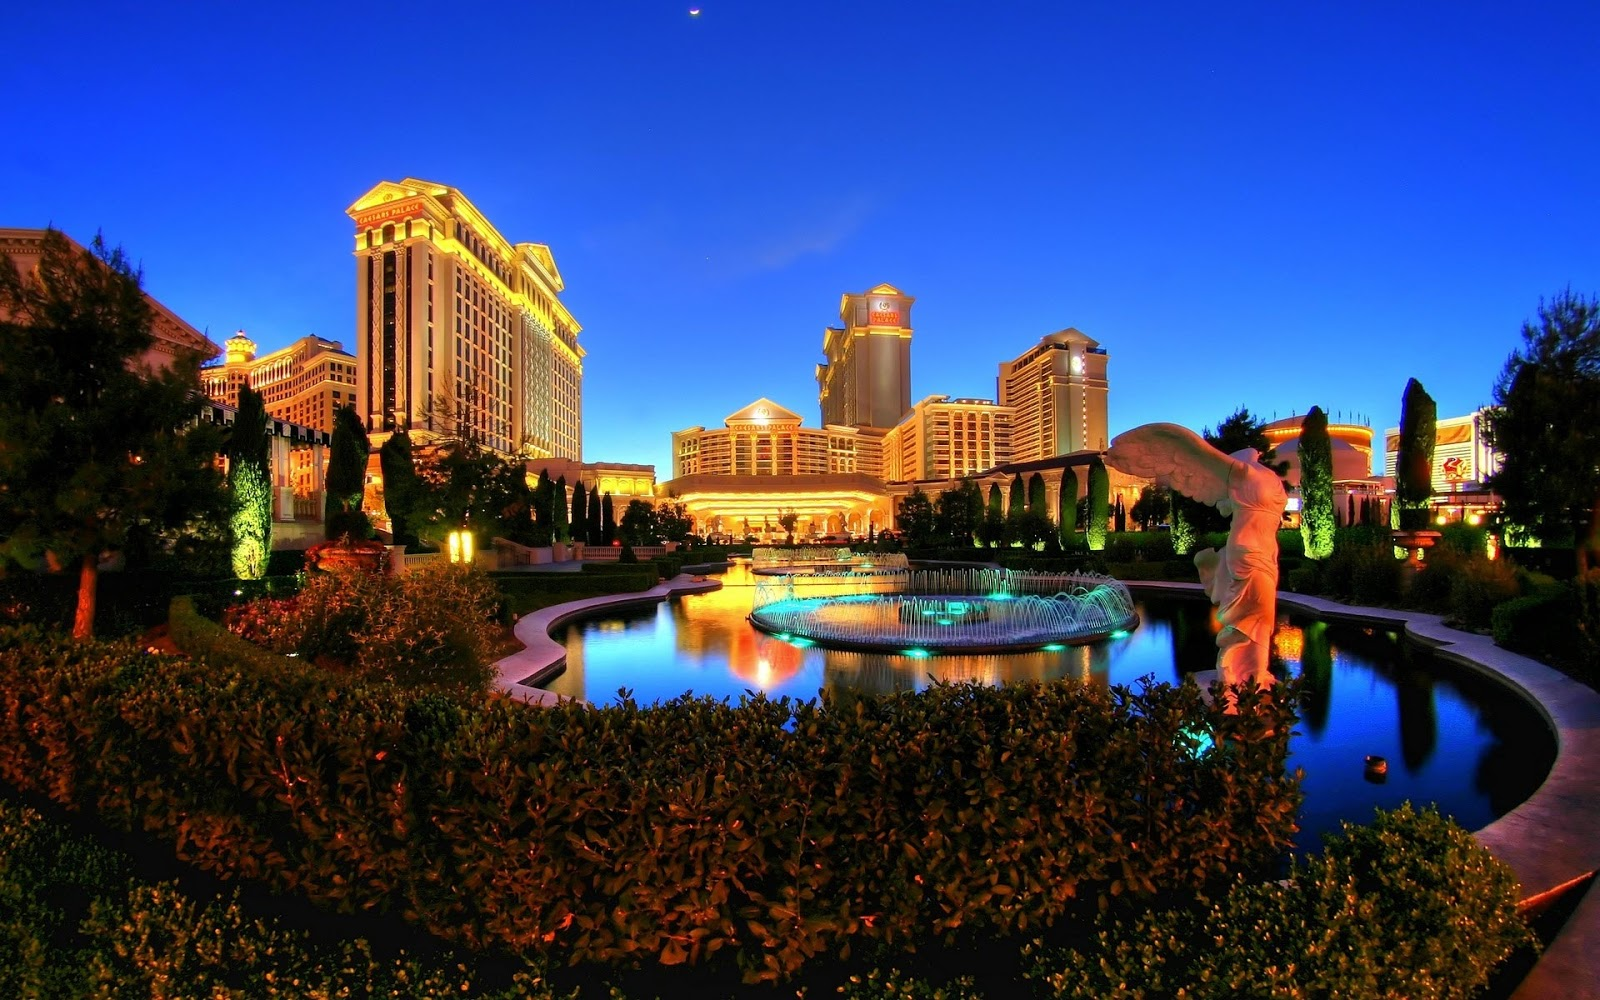 Ceasars Palace in Las Vegas